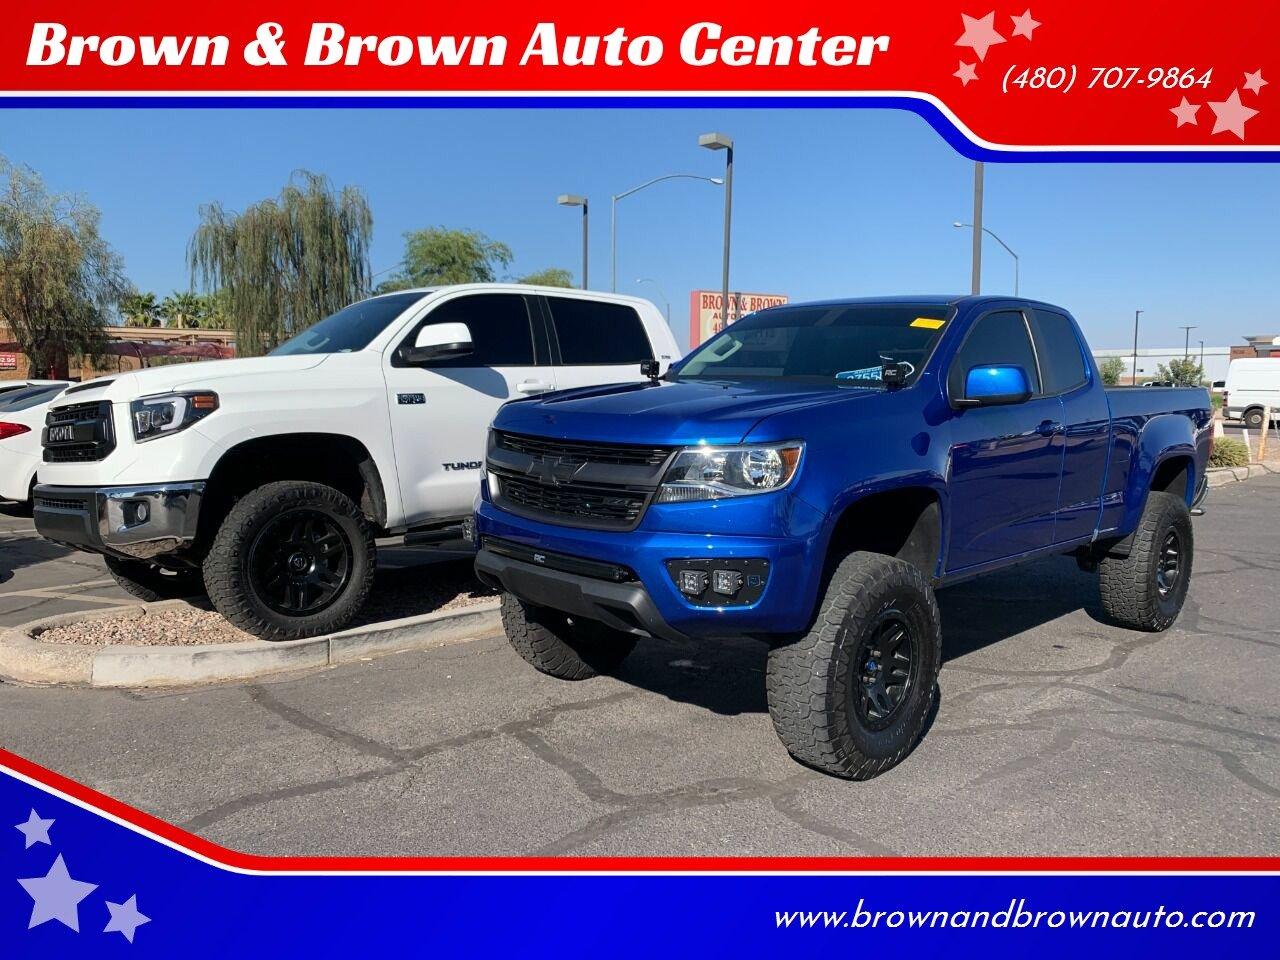 Brown & Brown Auto Center